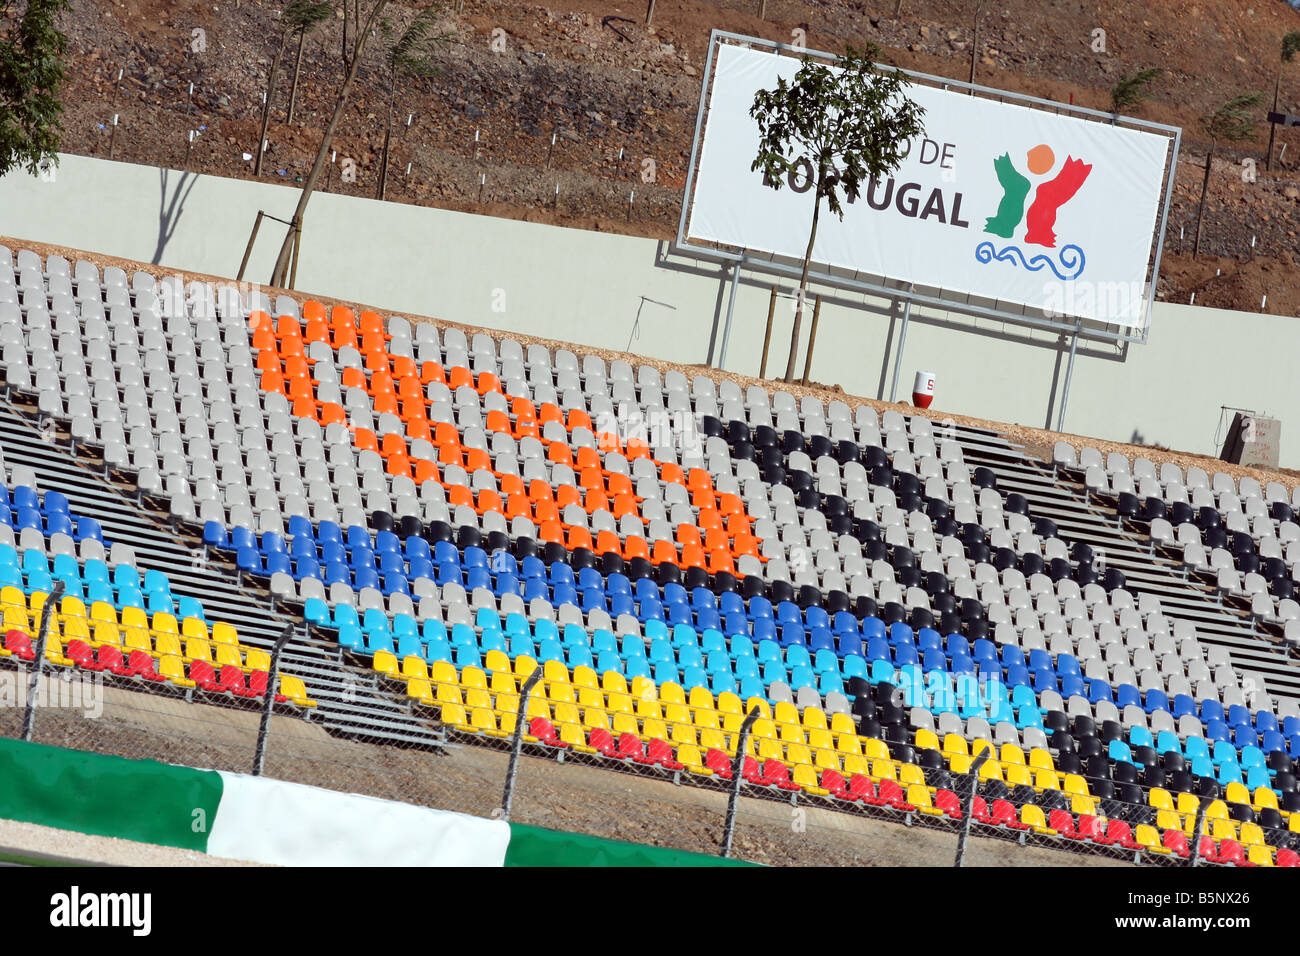 Circuito Algarve : Portimao algarve autodromo circuito tribune stand foto imagen de